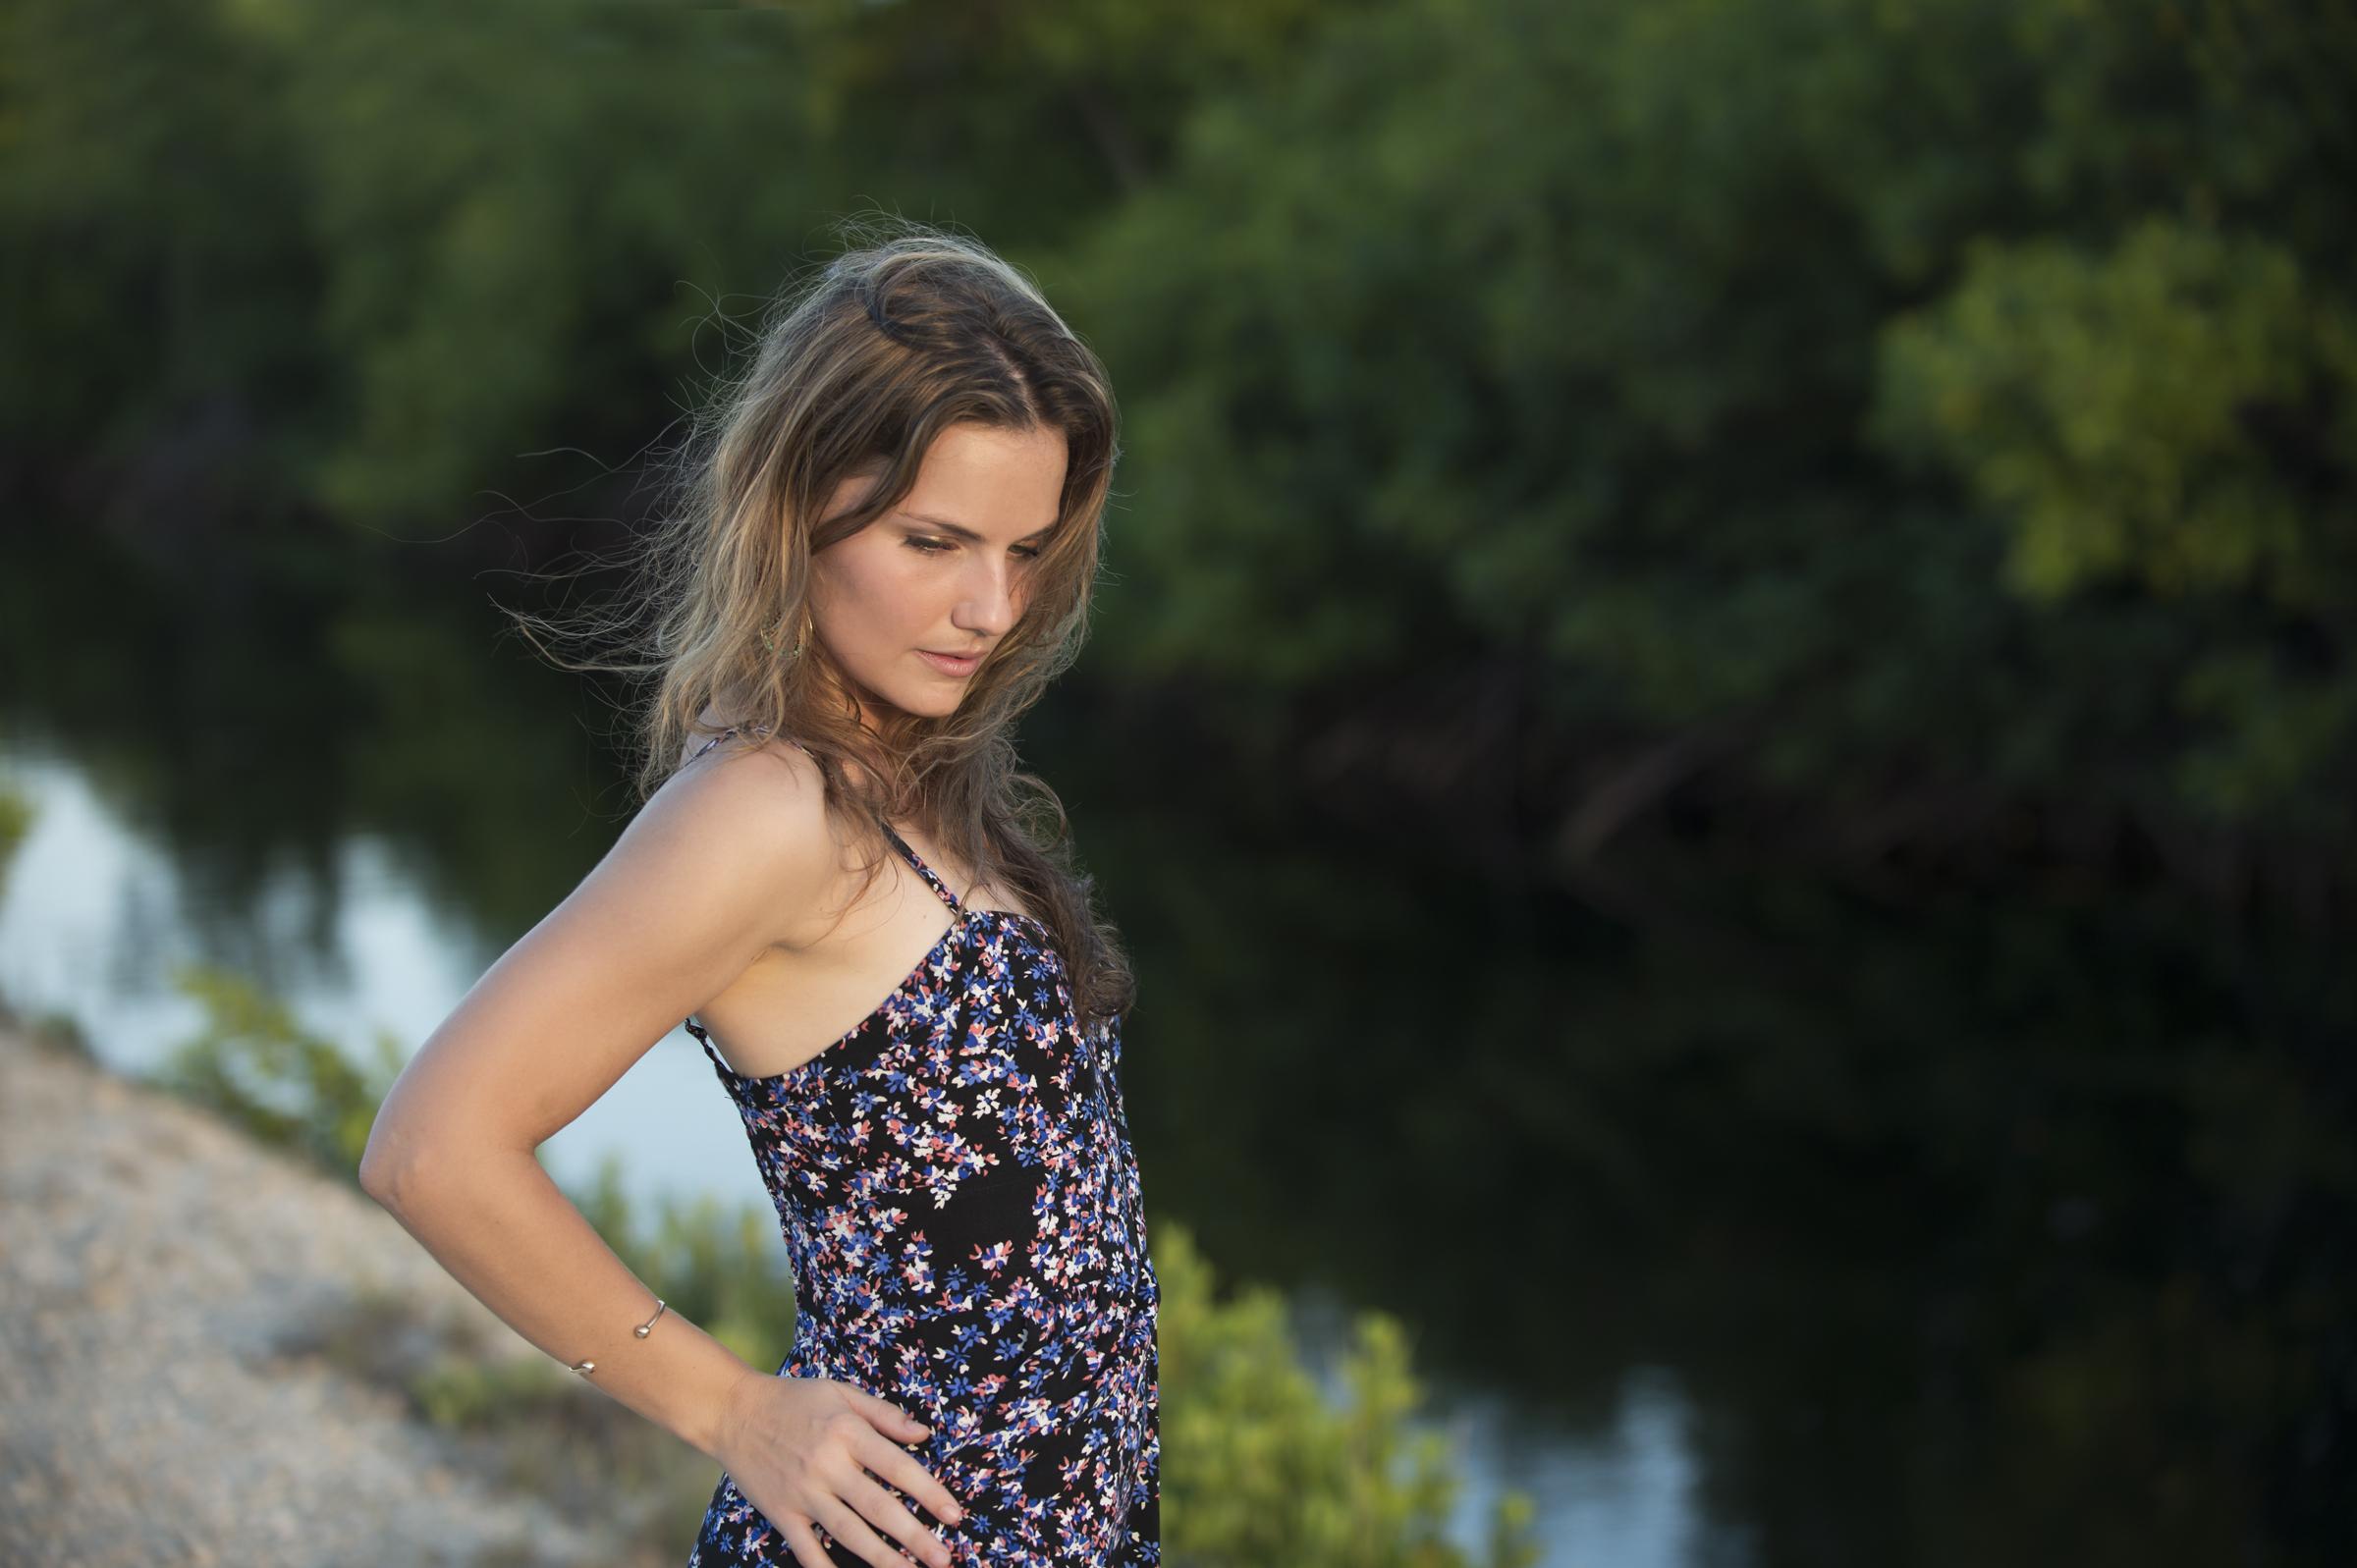 Alessandra Ambrosio lookalike #fashion #photographer